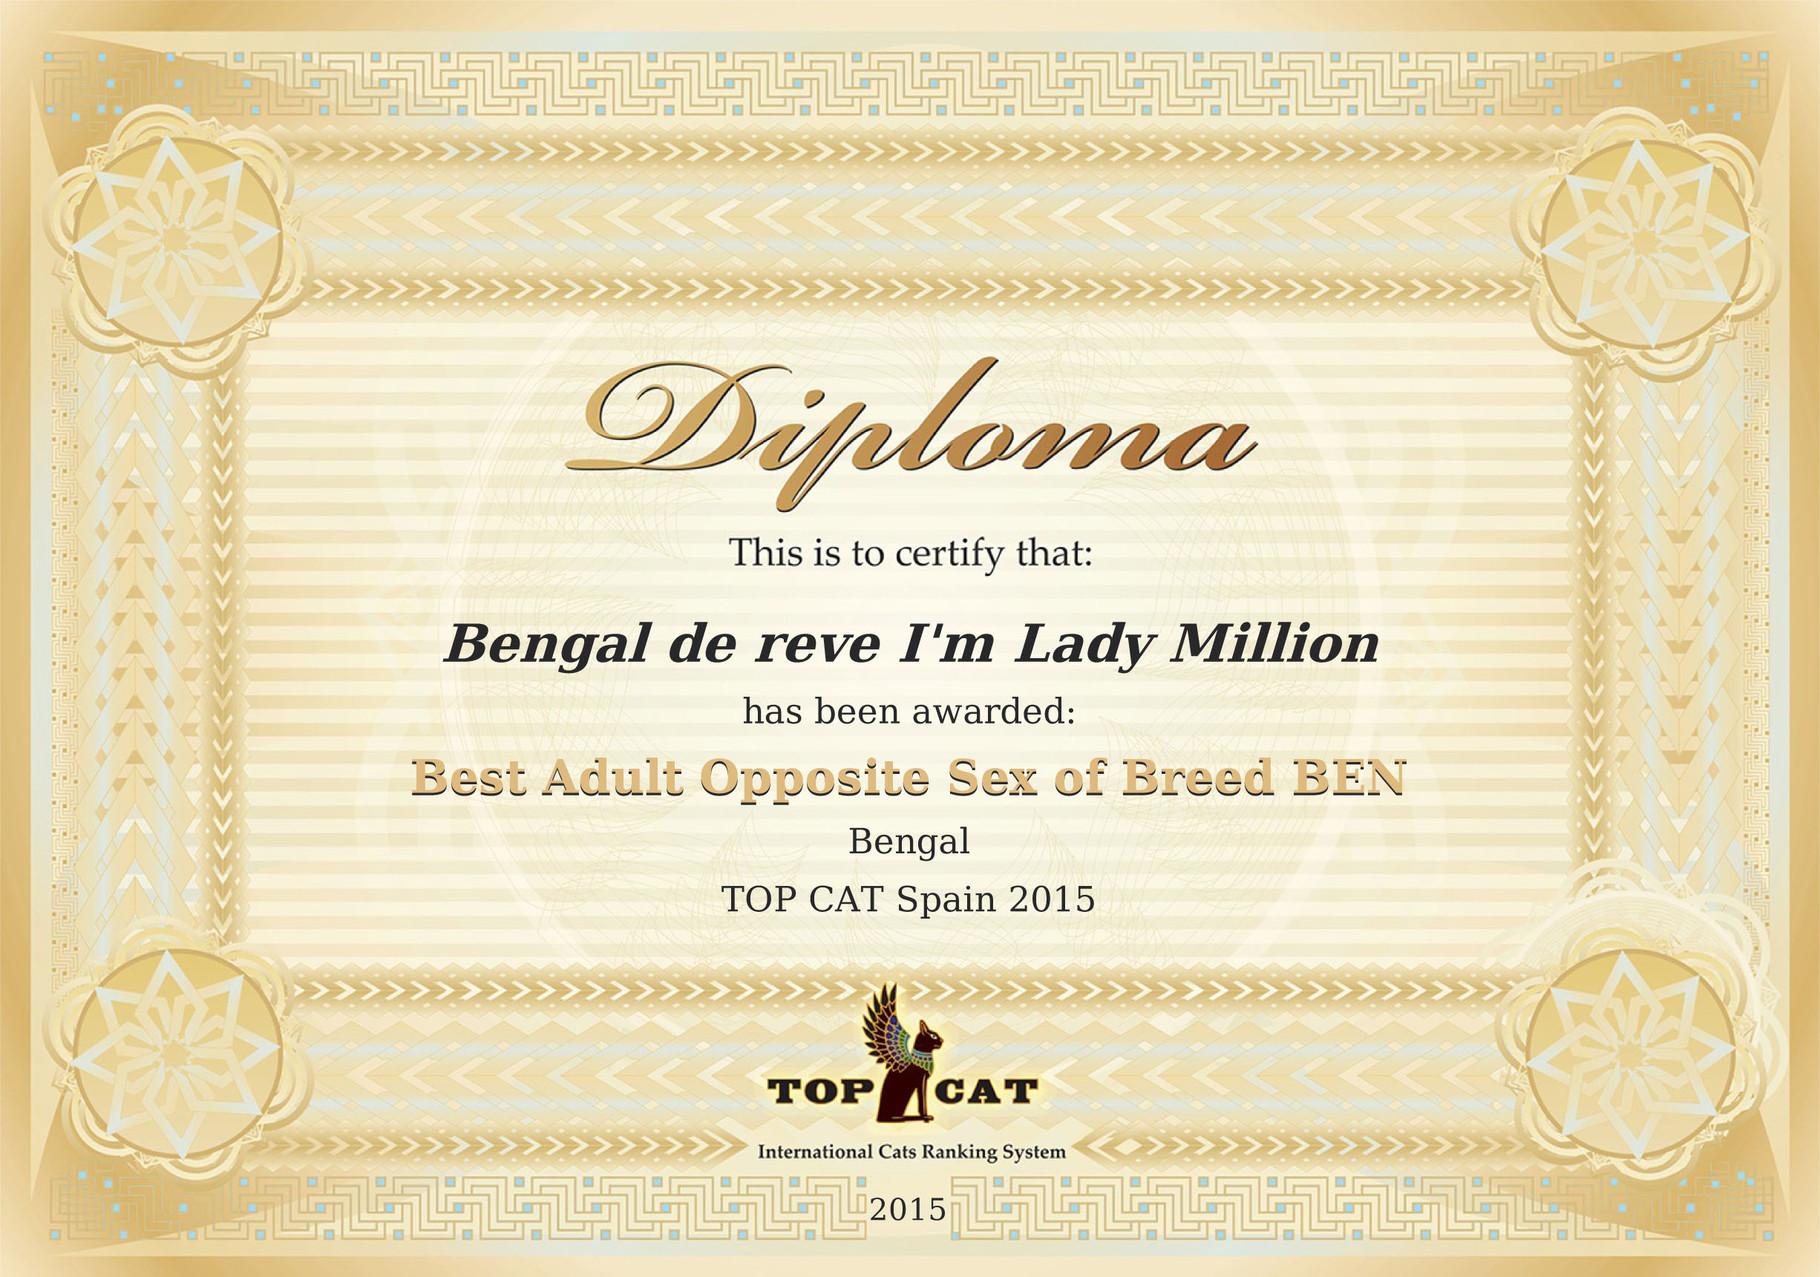 Raking Top Cat Mejor Bengal adulto sexo opuesto España 2015